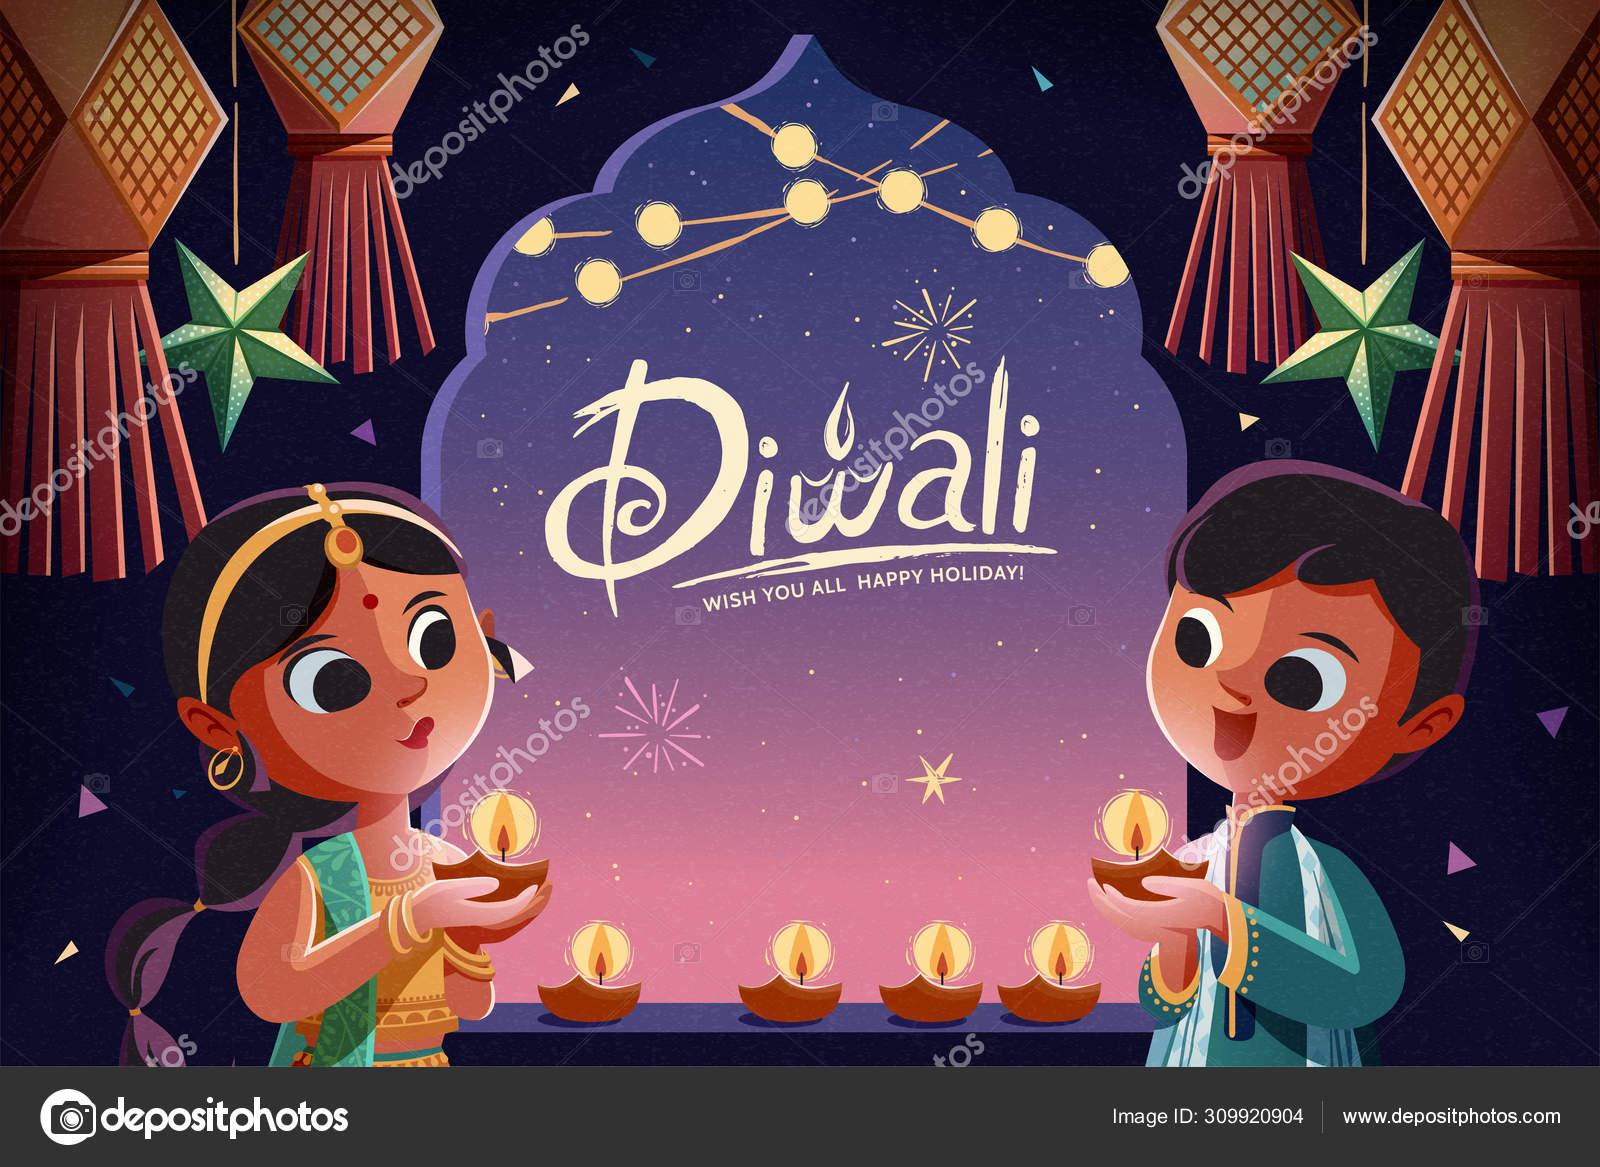 Áˆ Diwali Cartoon Stock Drawings Royalty Free Diwali With Child Vectors Download On Depositphotos